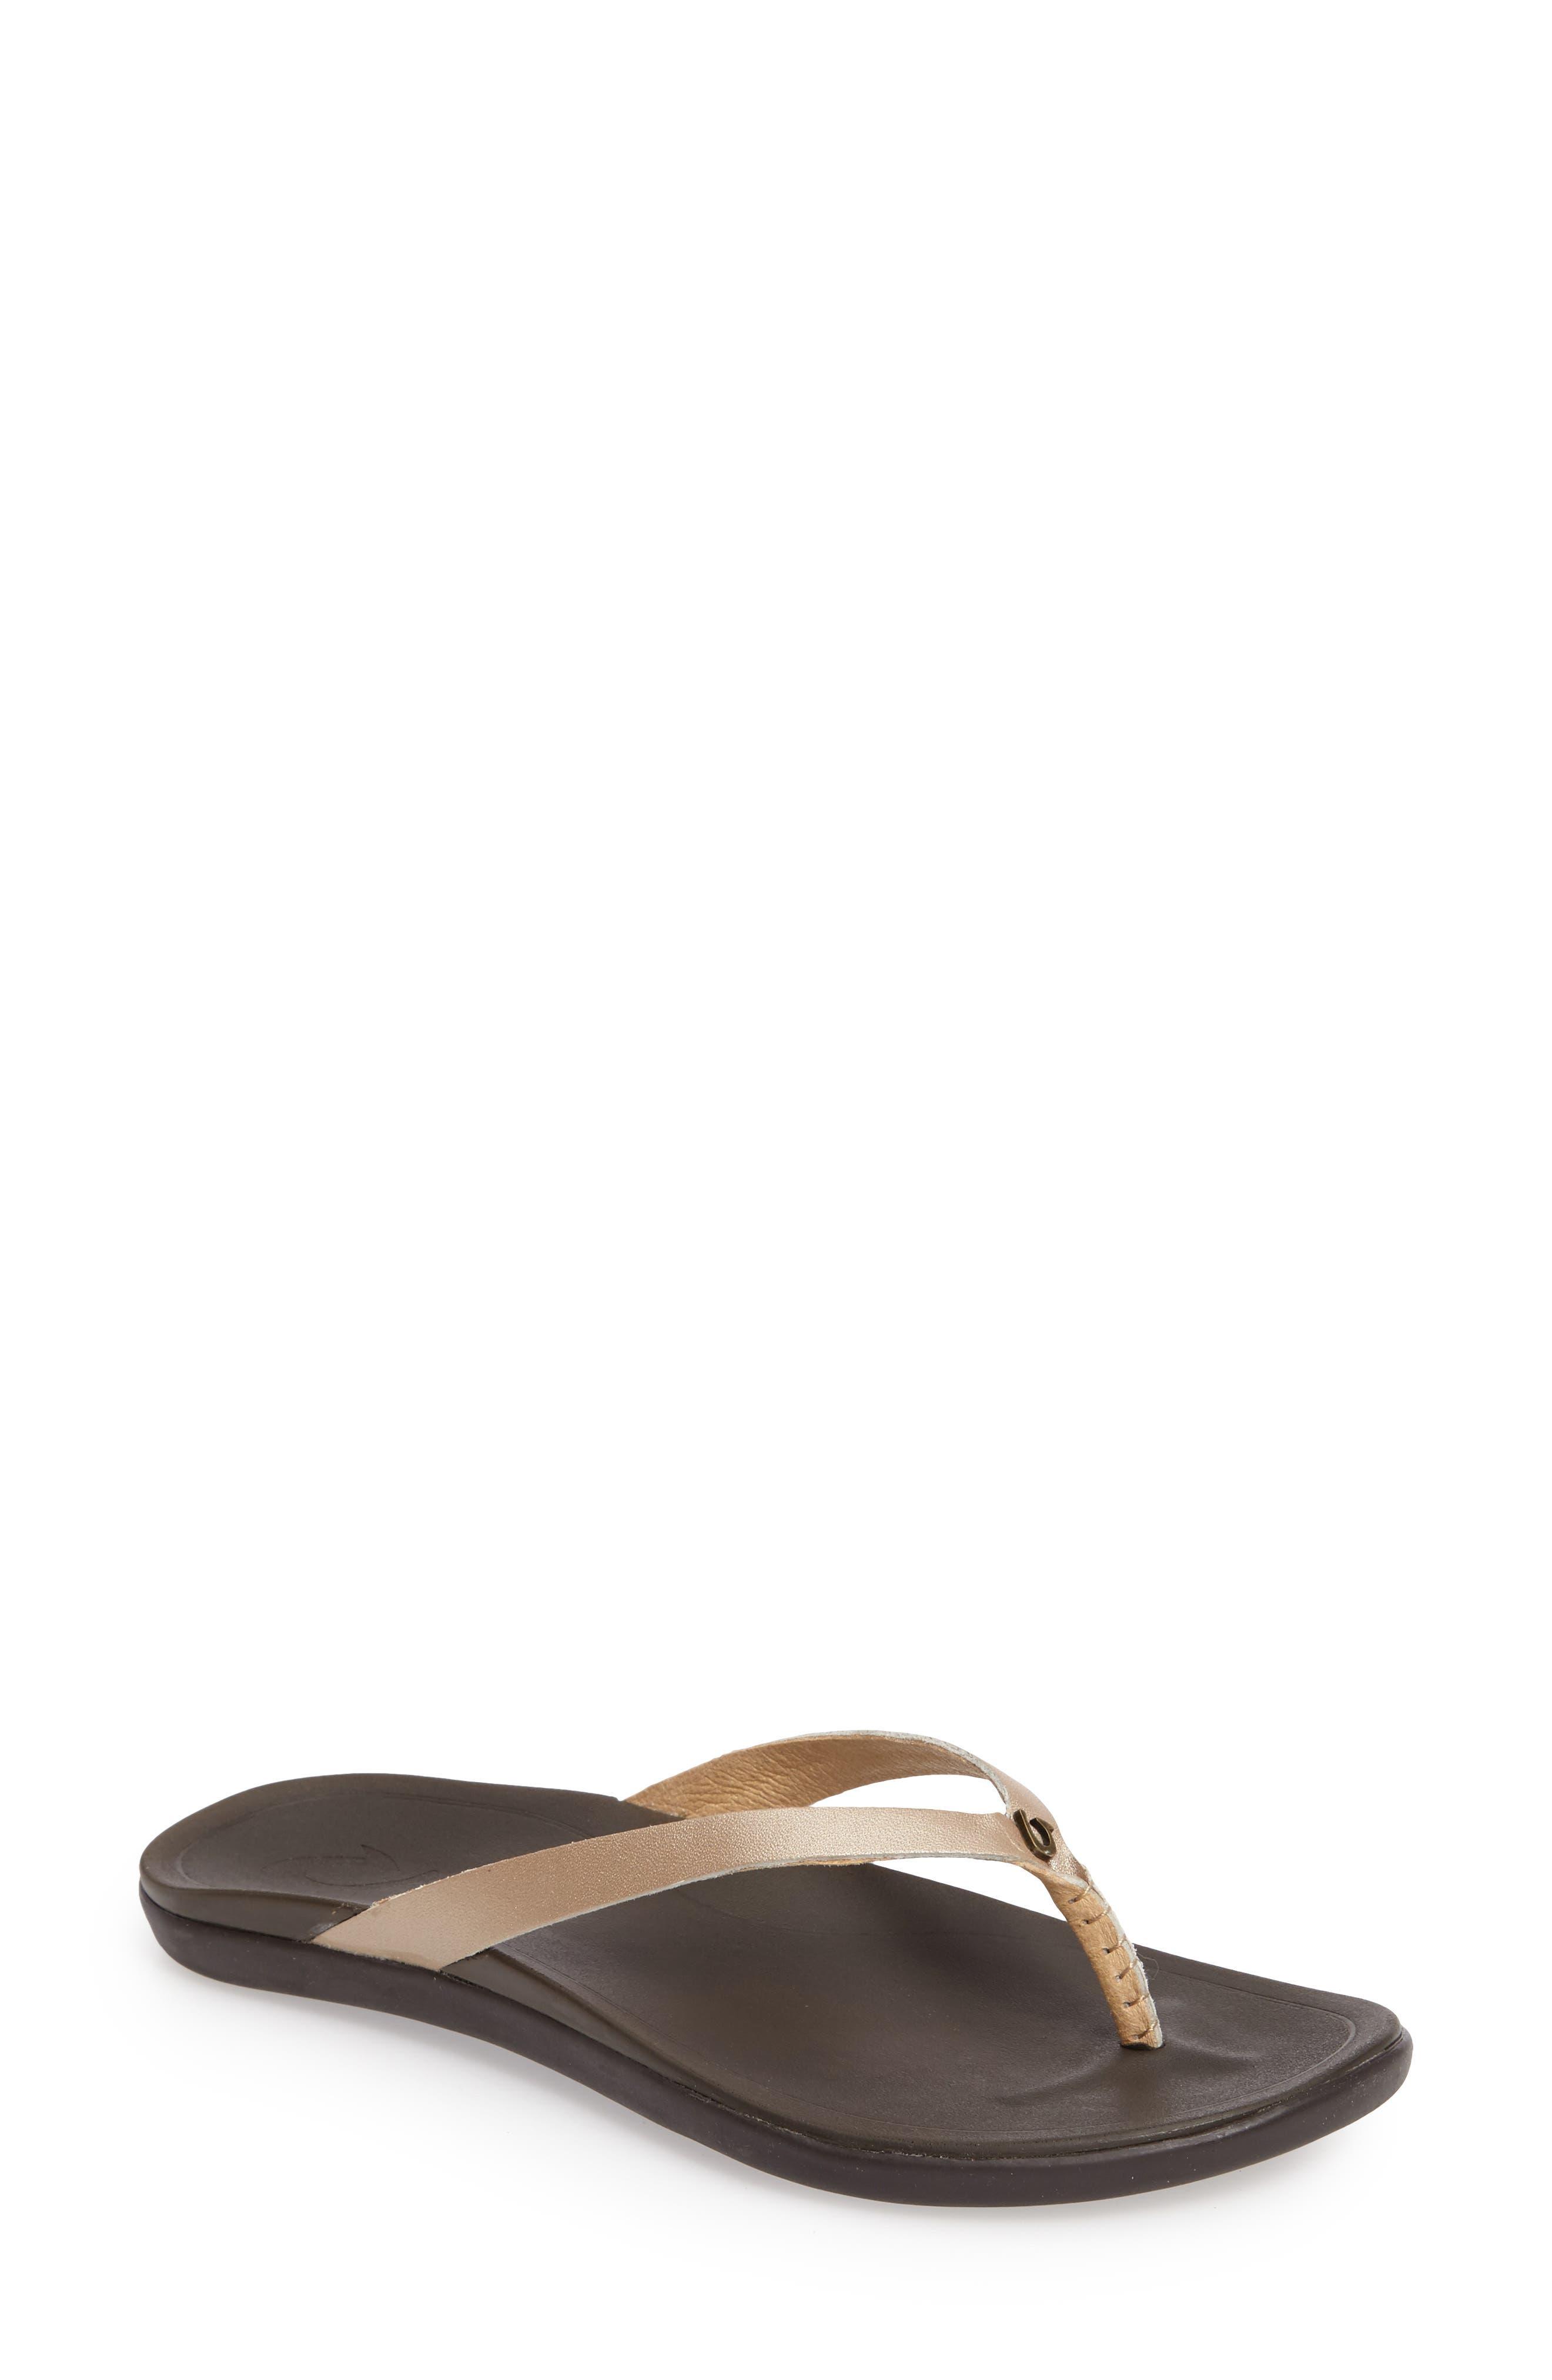 Main Image - OluKai 'Ho Opio' Leather Flip Flop (Women)